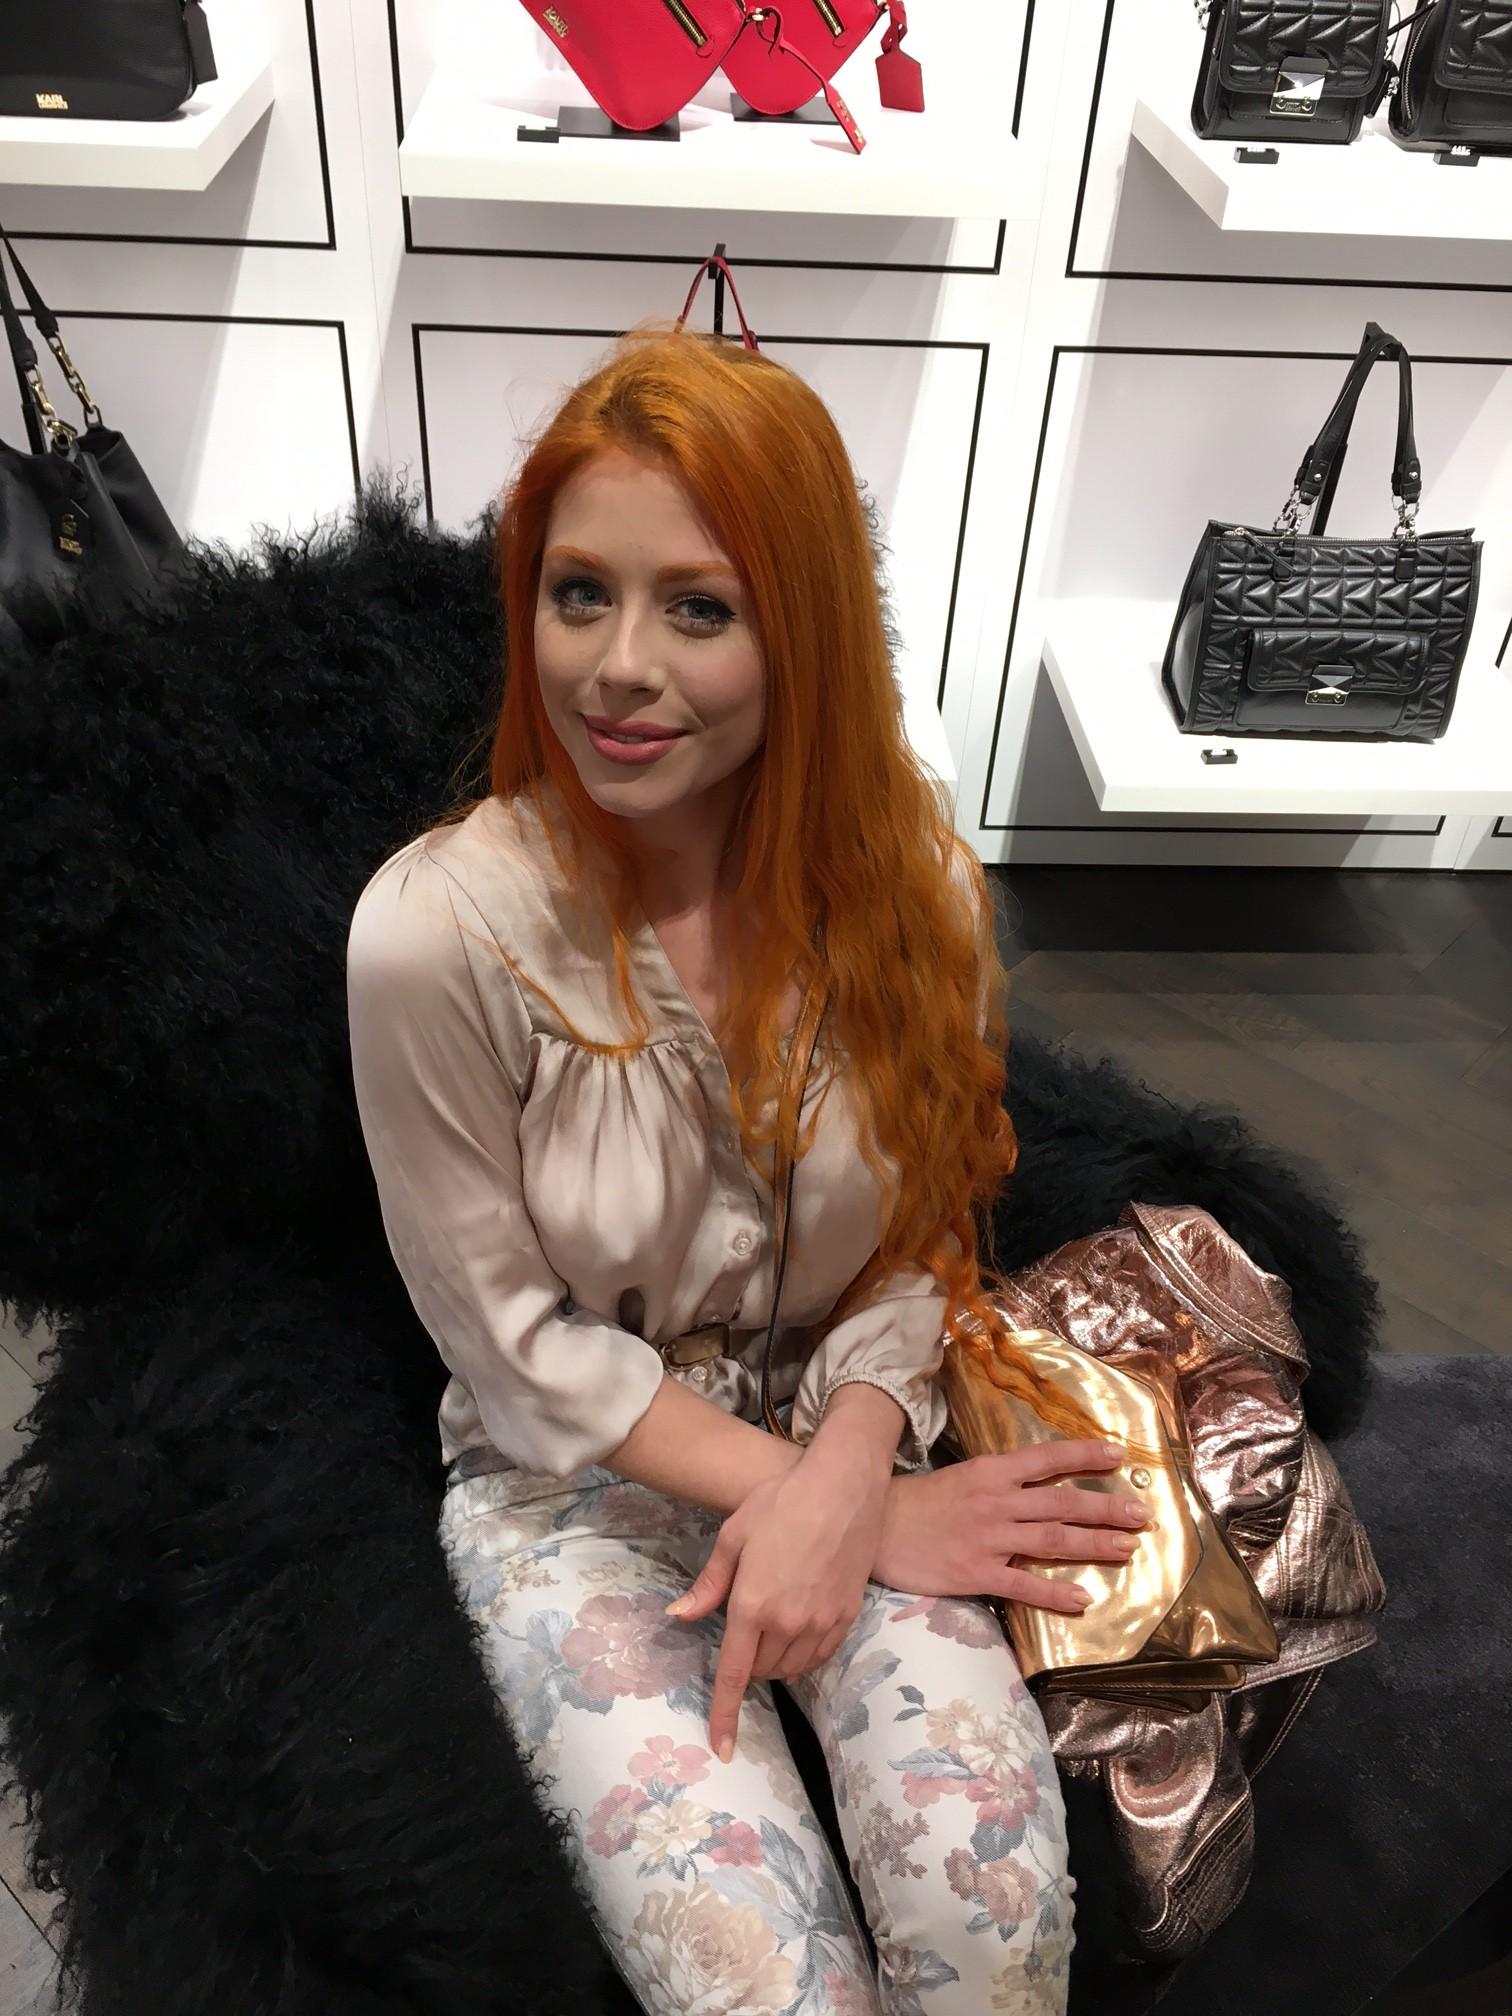 Ophelia Overdose, Miss Overdose, Fashionblog Lieblingsstil, Fashion Blog Lieblingsstil, Modeblog Lieblingsstil